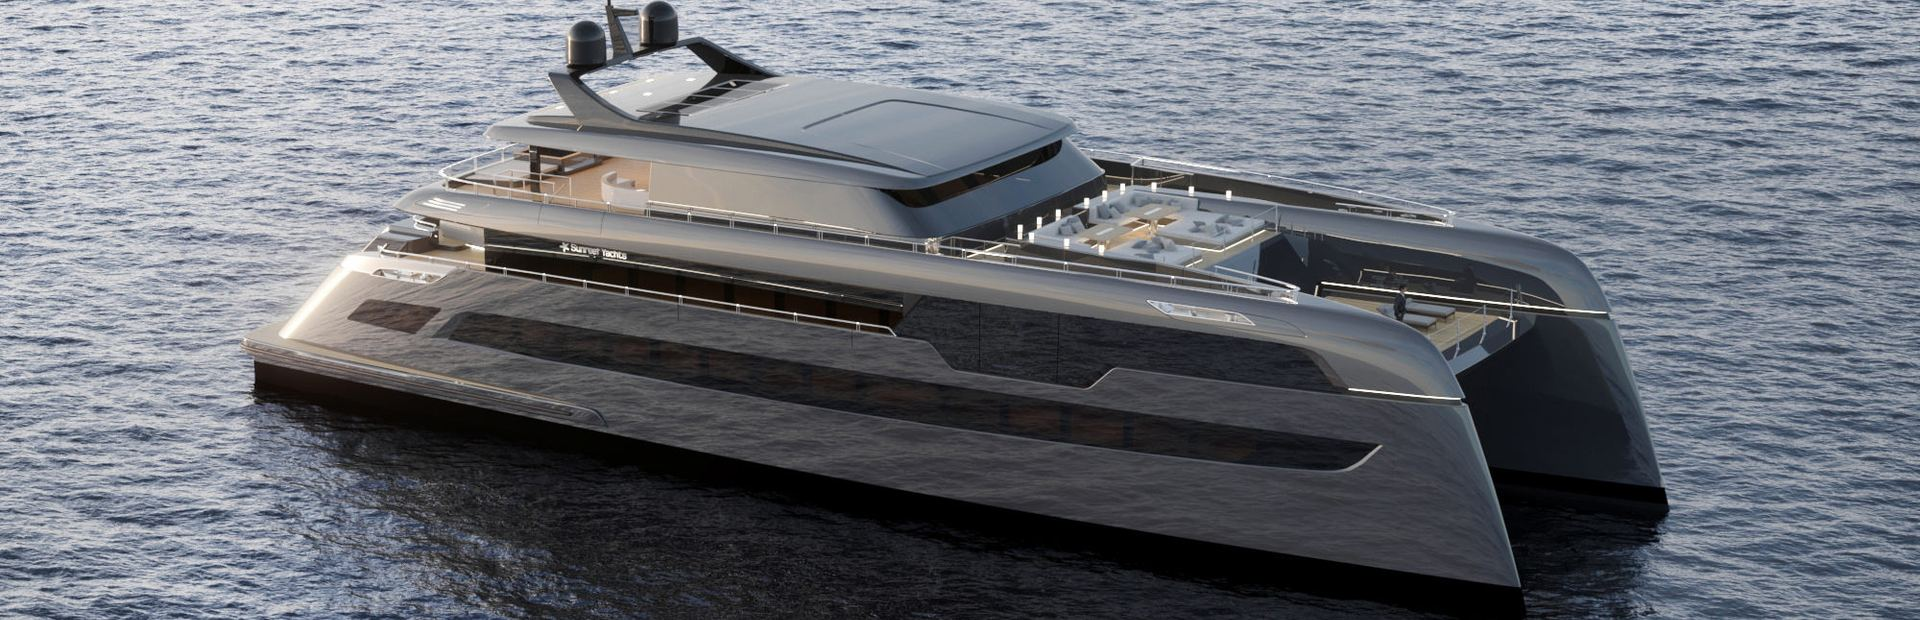 49M Sunreef Power Yacht Charter